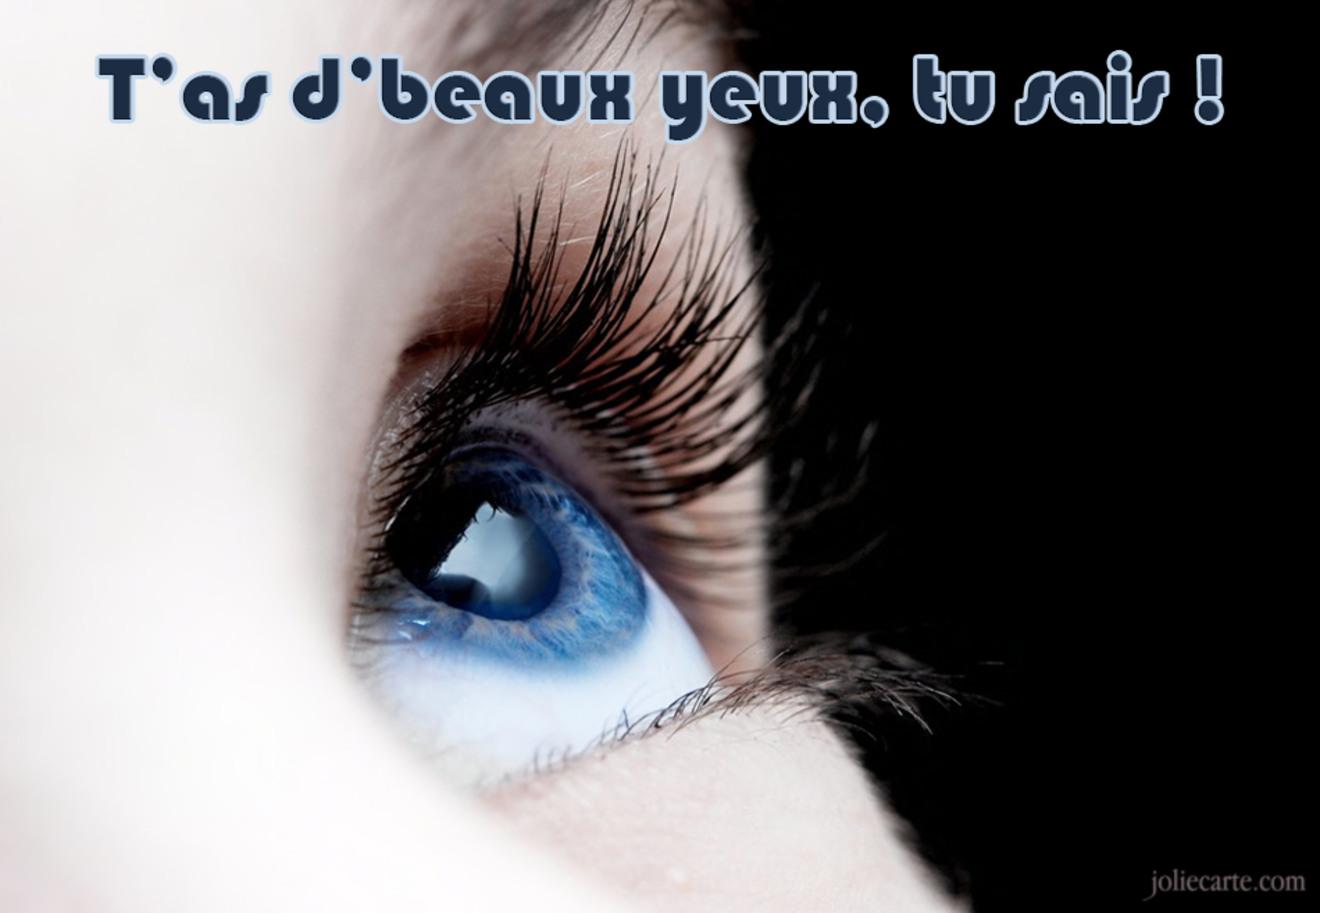 Tu as de beaux yeux